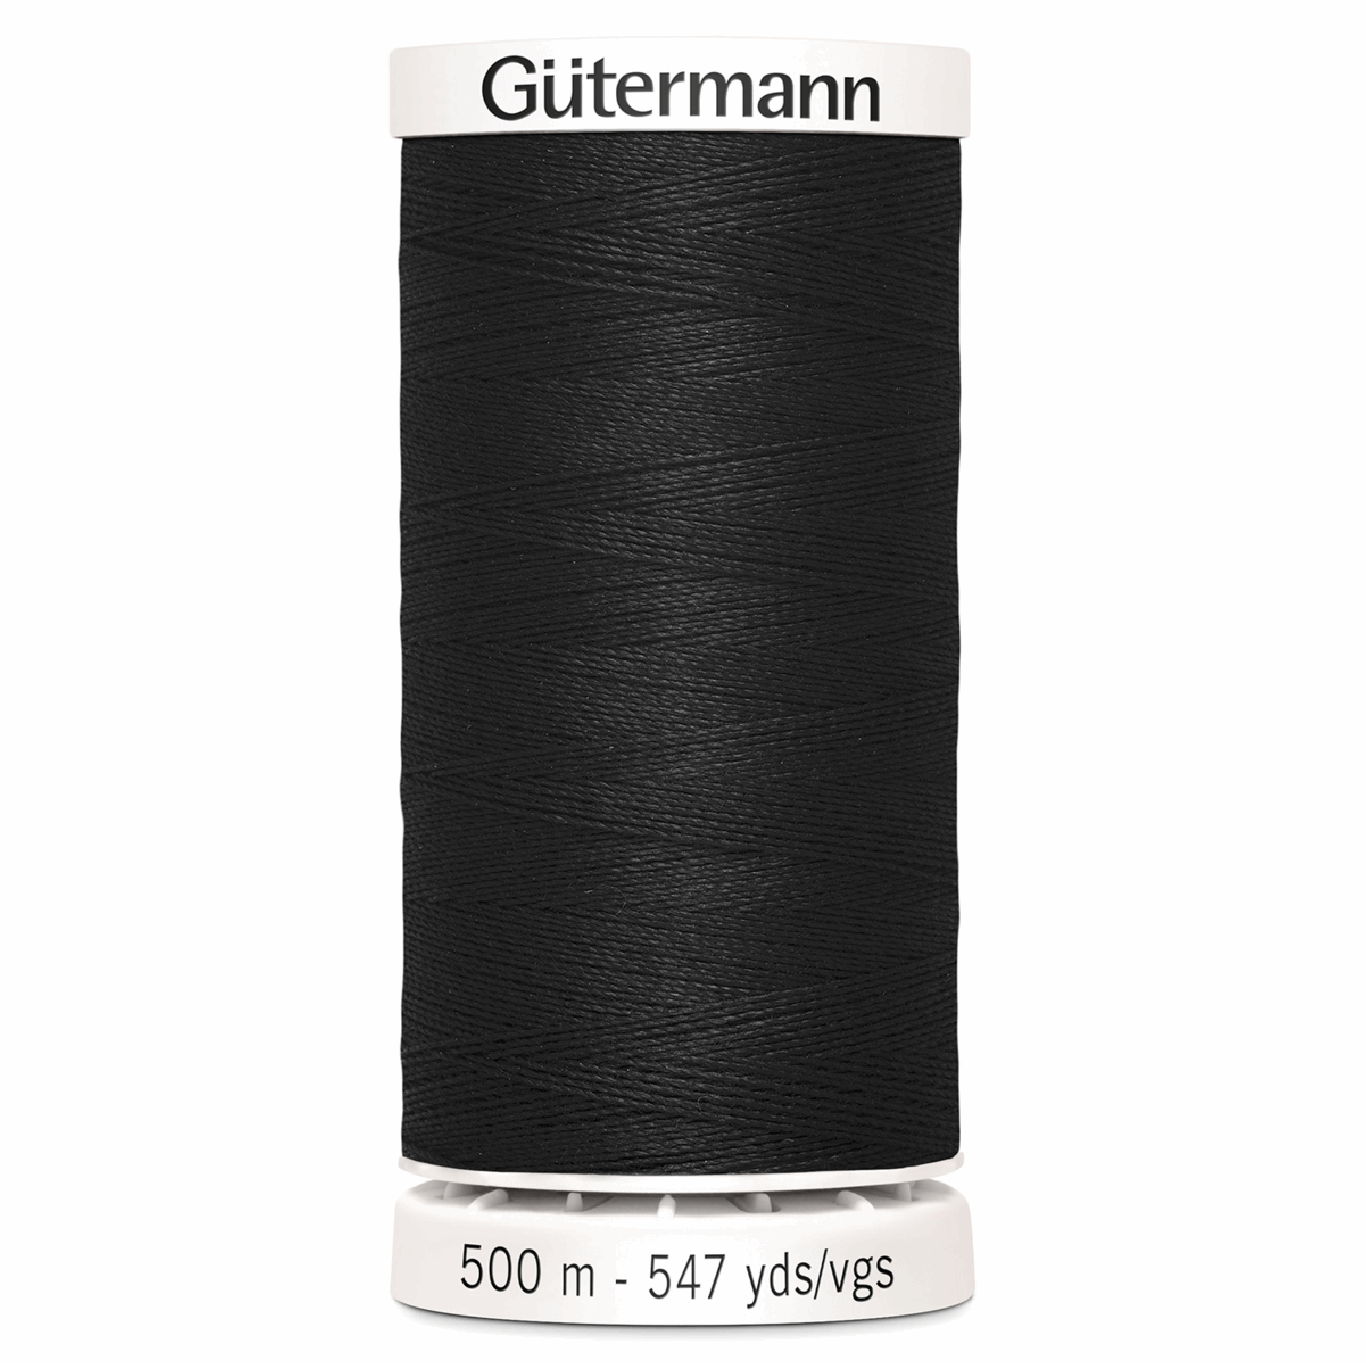 Image of Gutermann Sew All Thread 500m